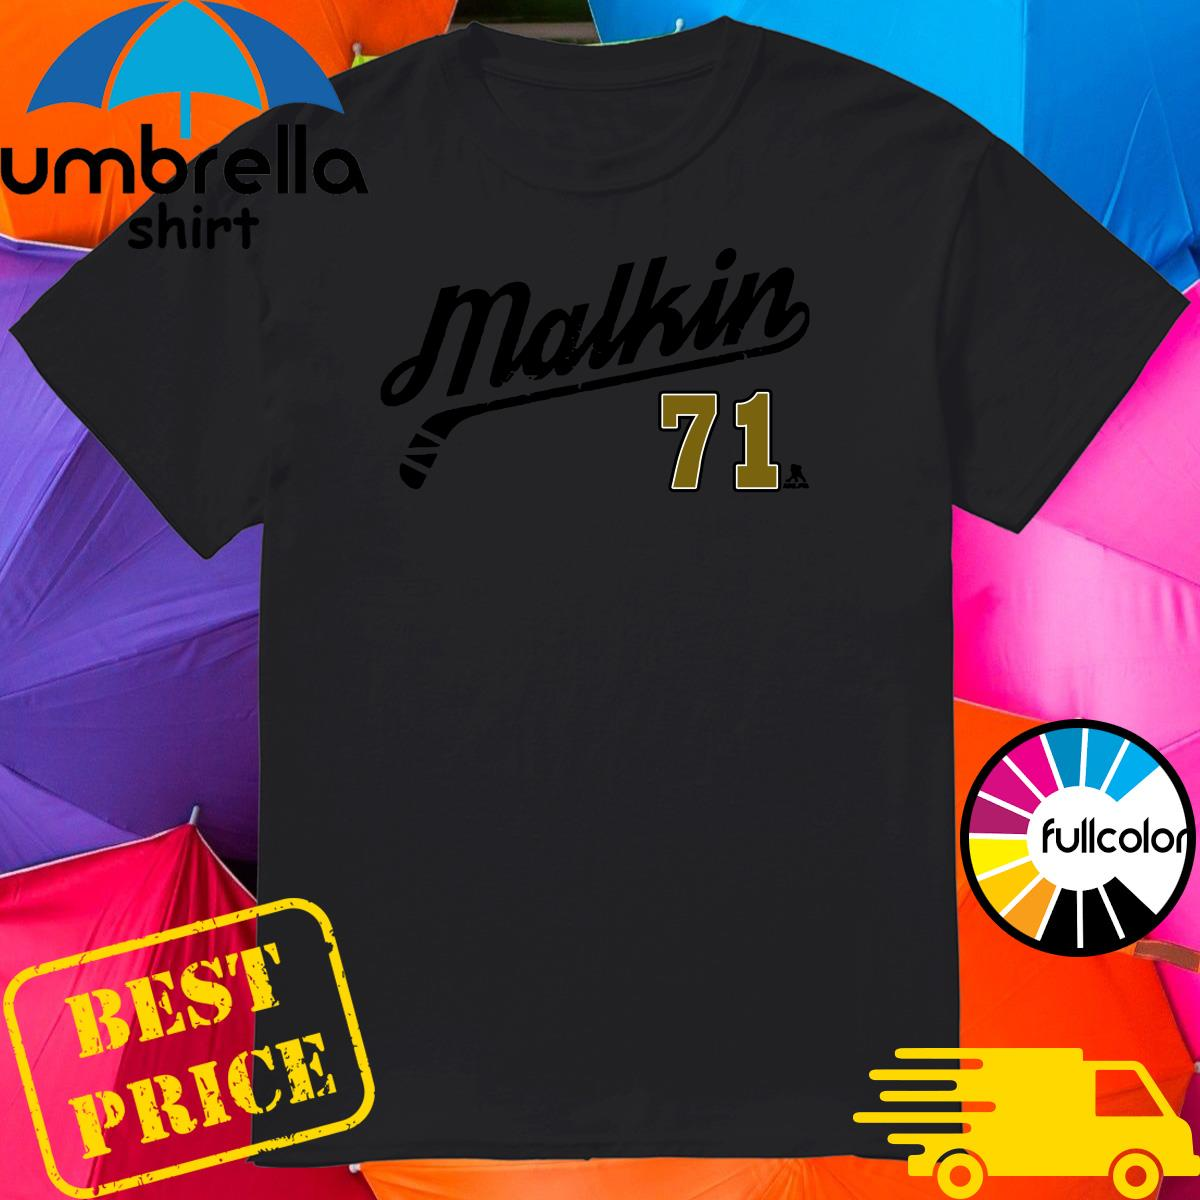 The Evgeni Malkin 71 Number Tee Shirt